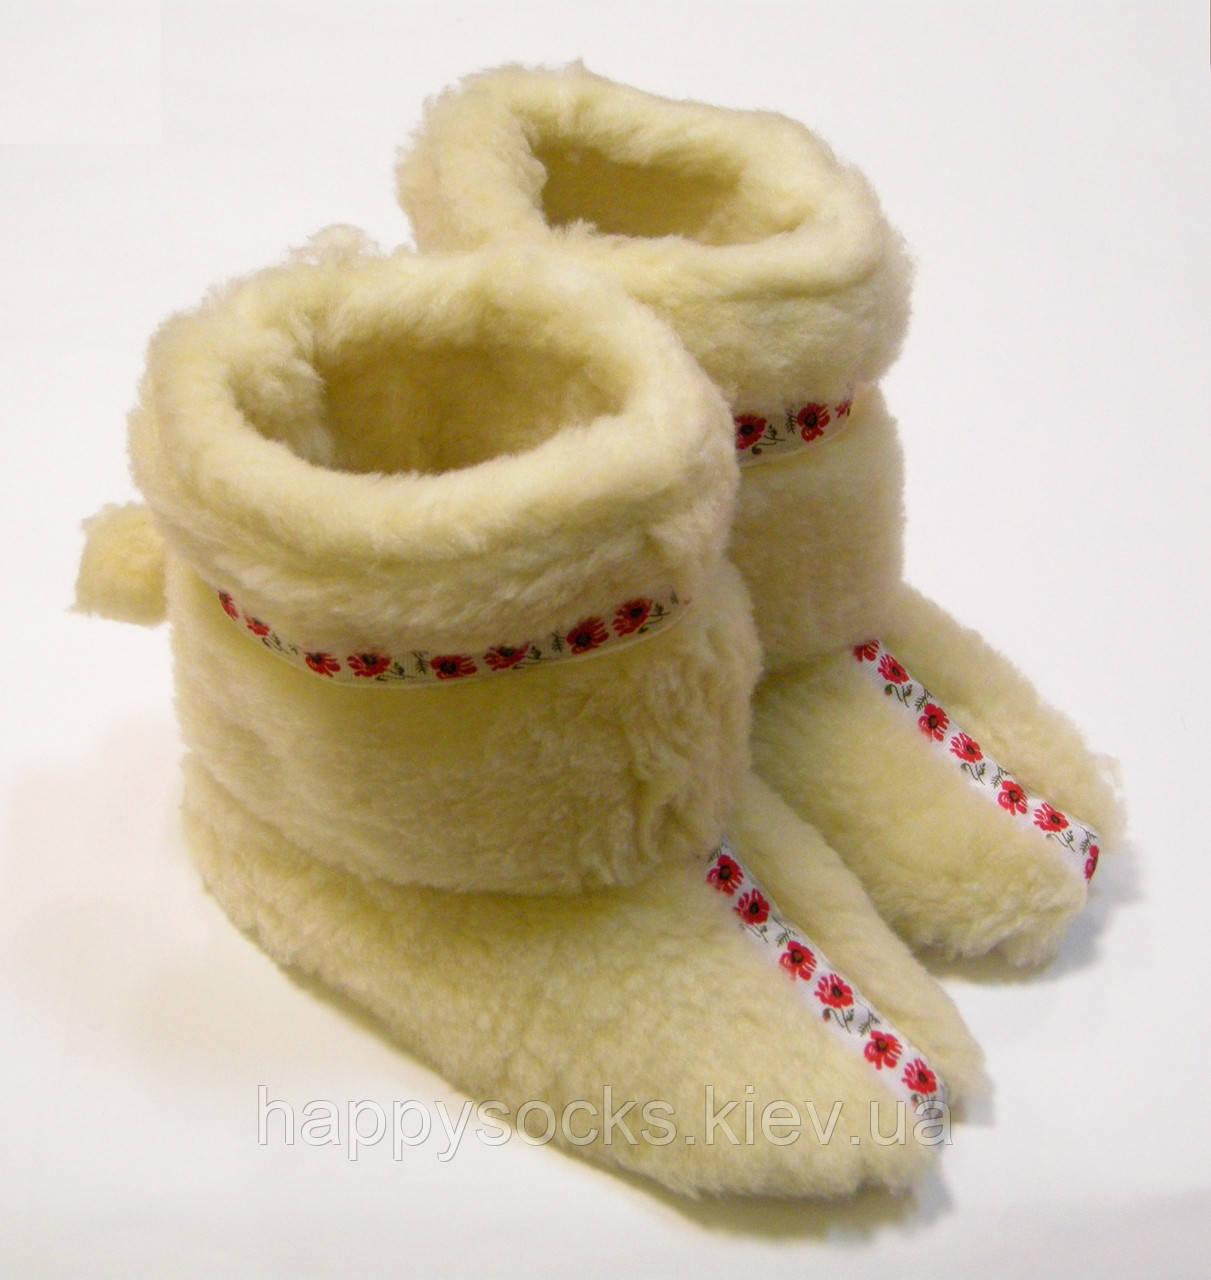 Теплые тапочки-сапожки с помпонами и украинским орнаментом